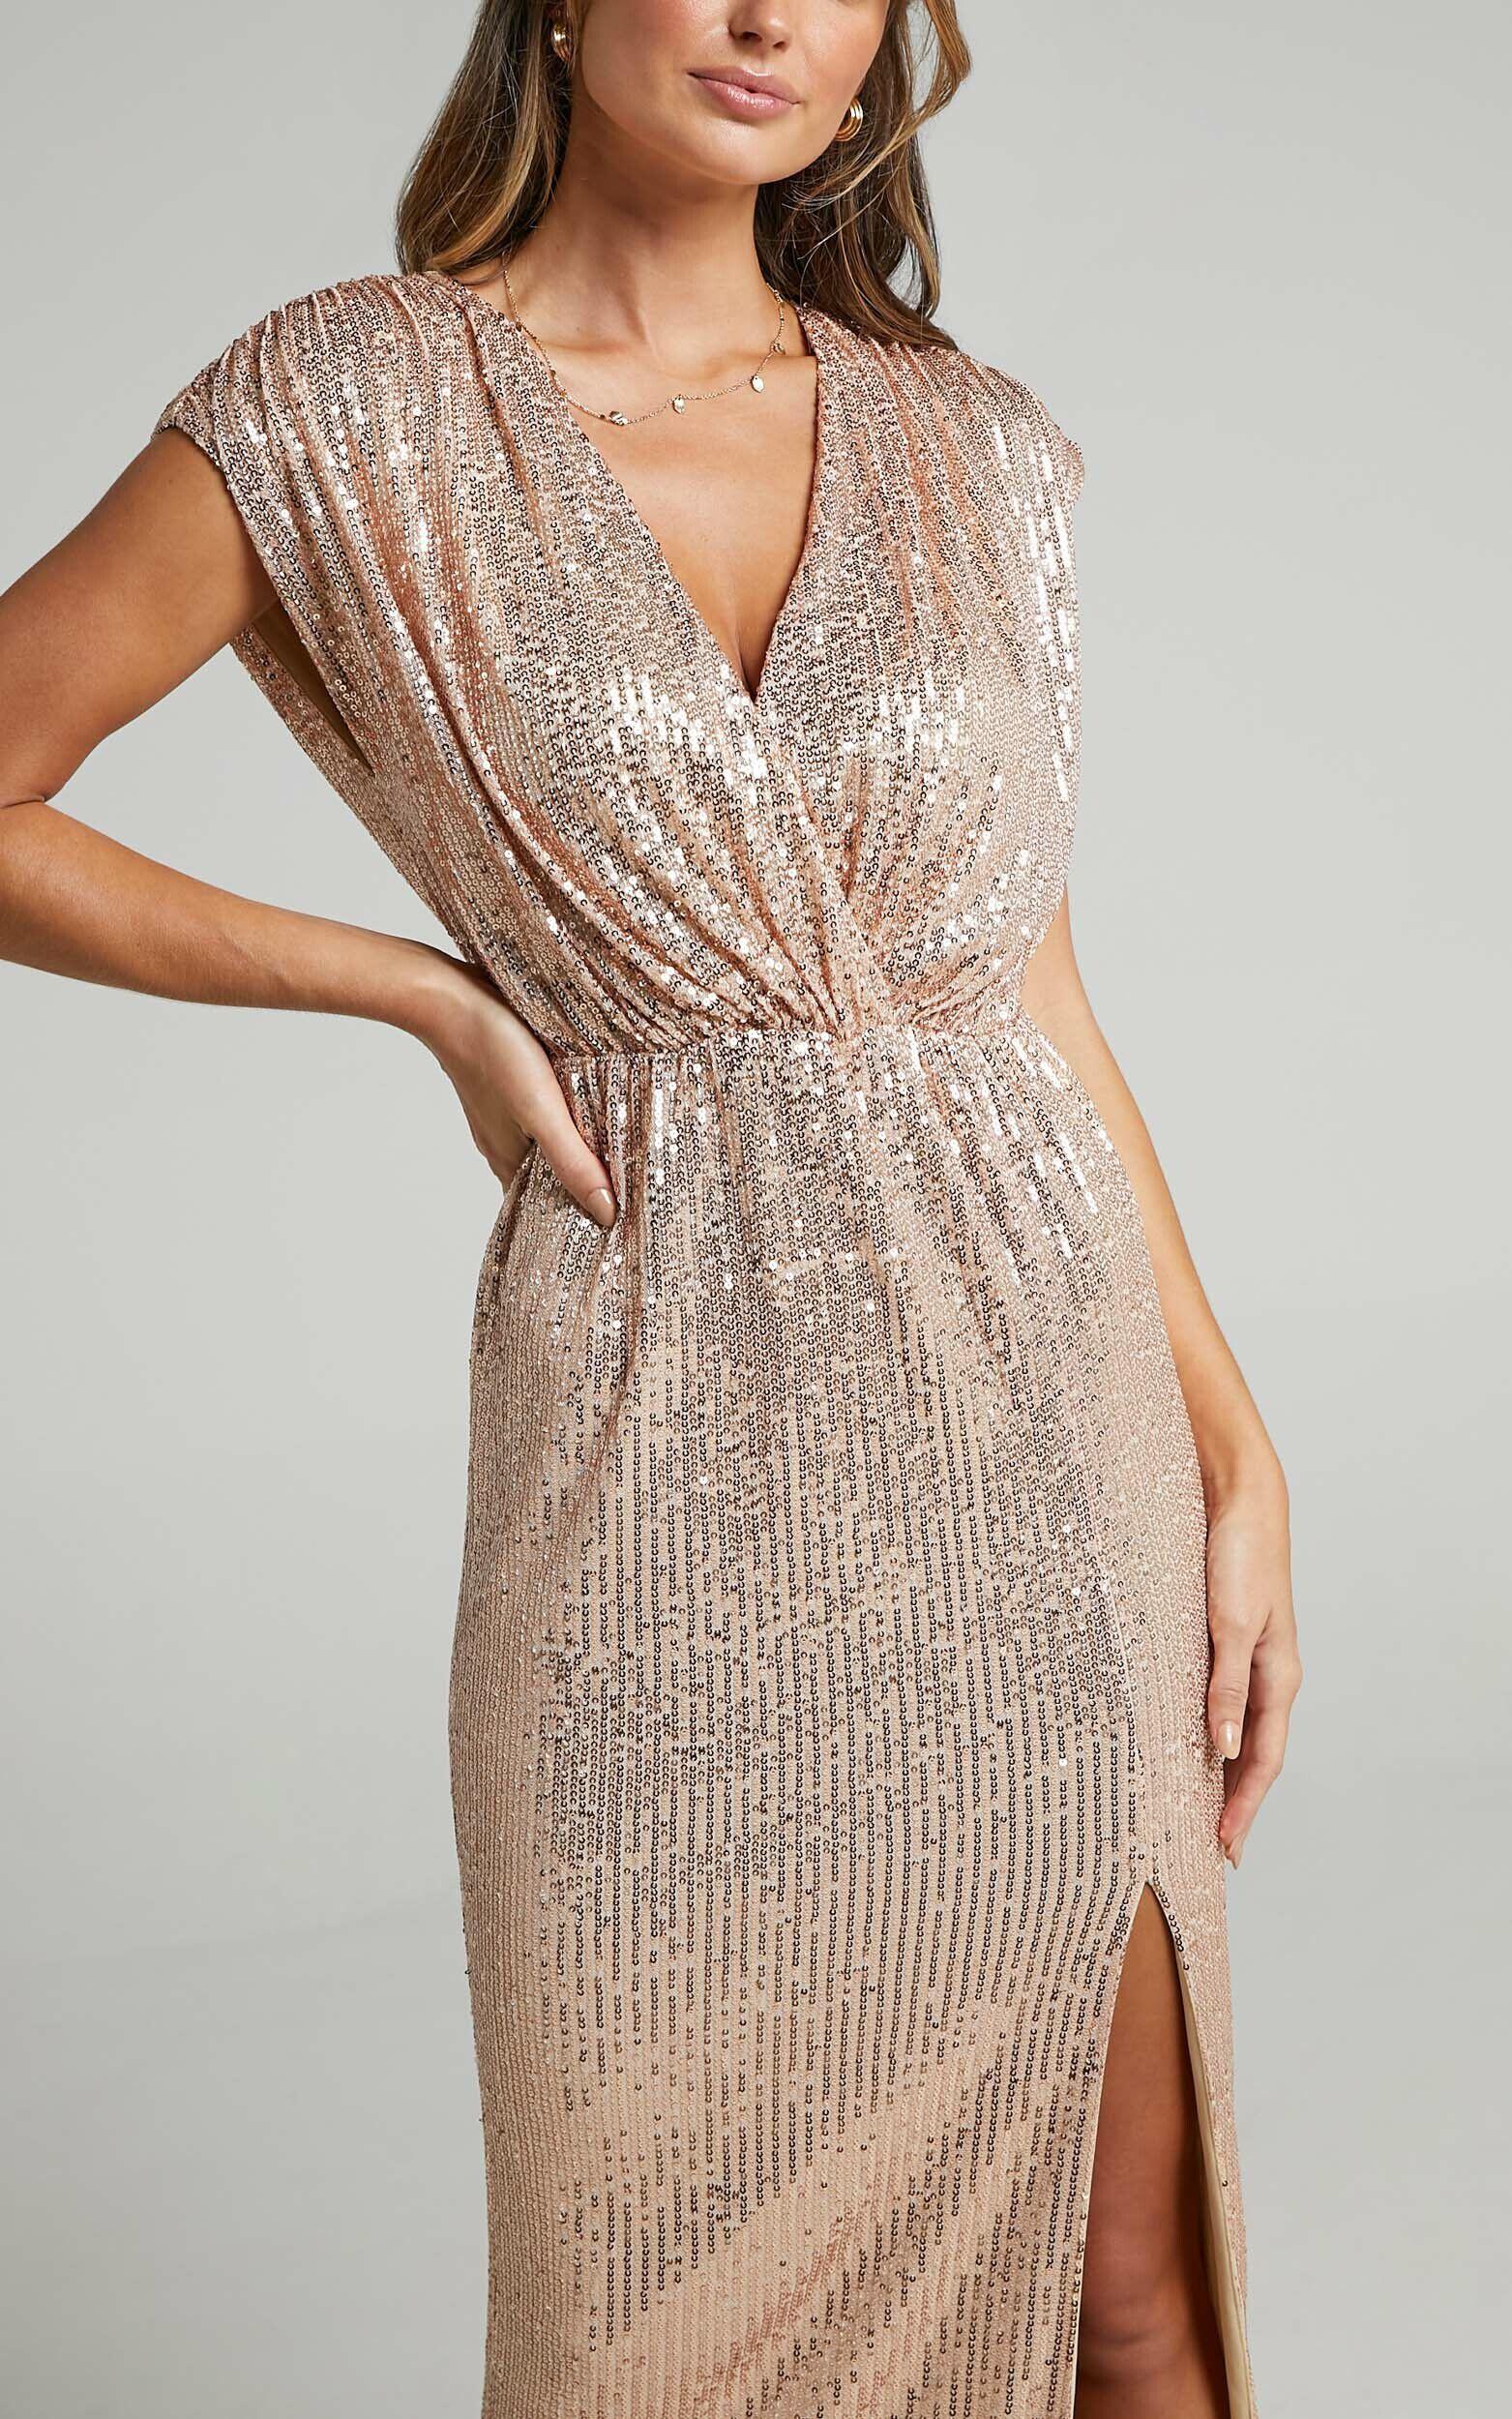 Remember The Day Dress in Rose Gold Sequin - 10, RSG1, super-hi-res image number null